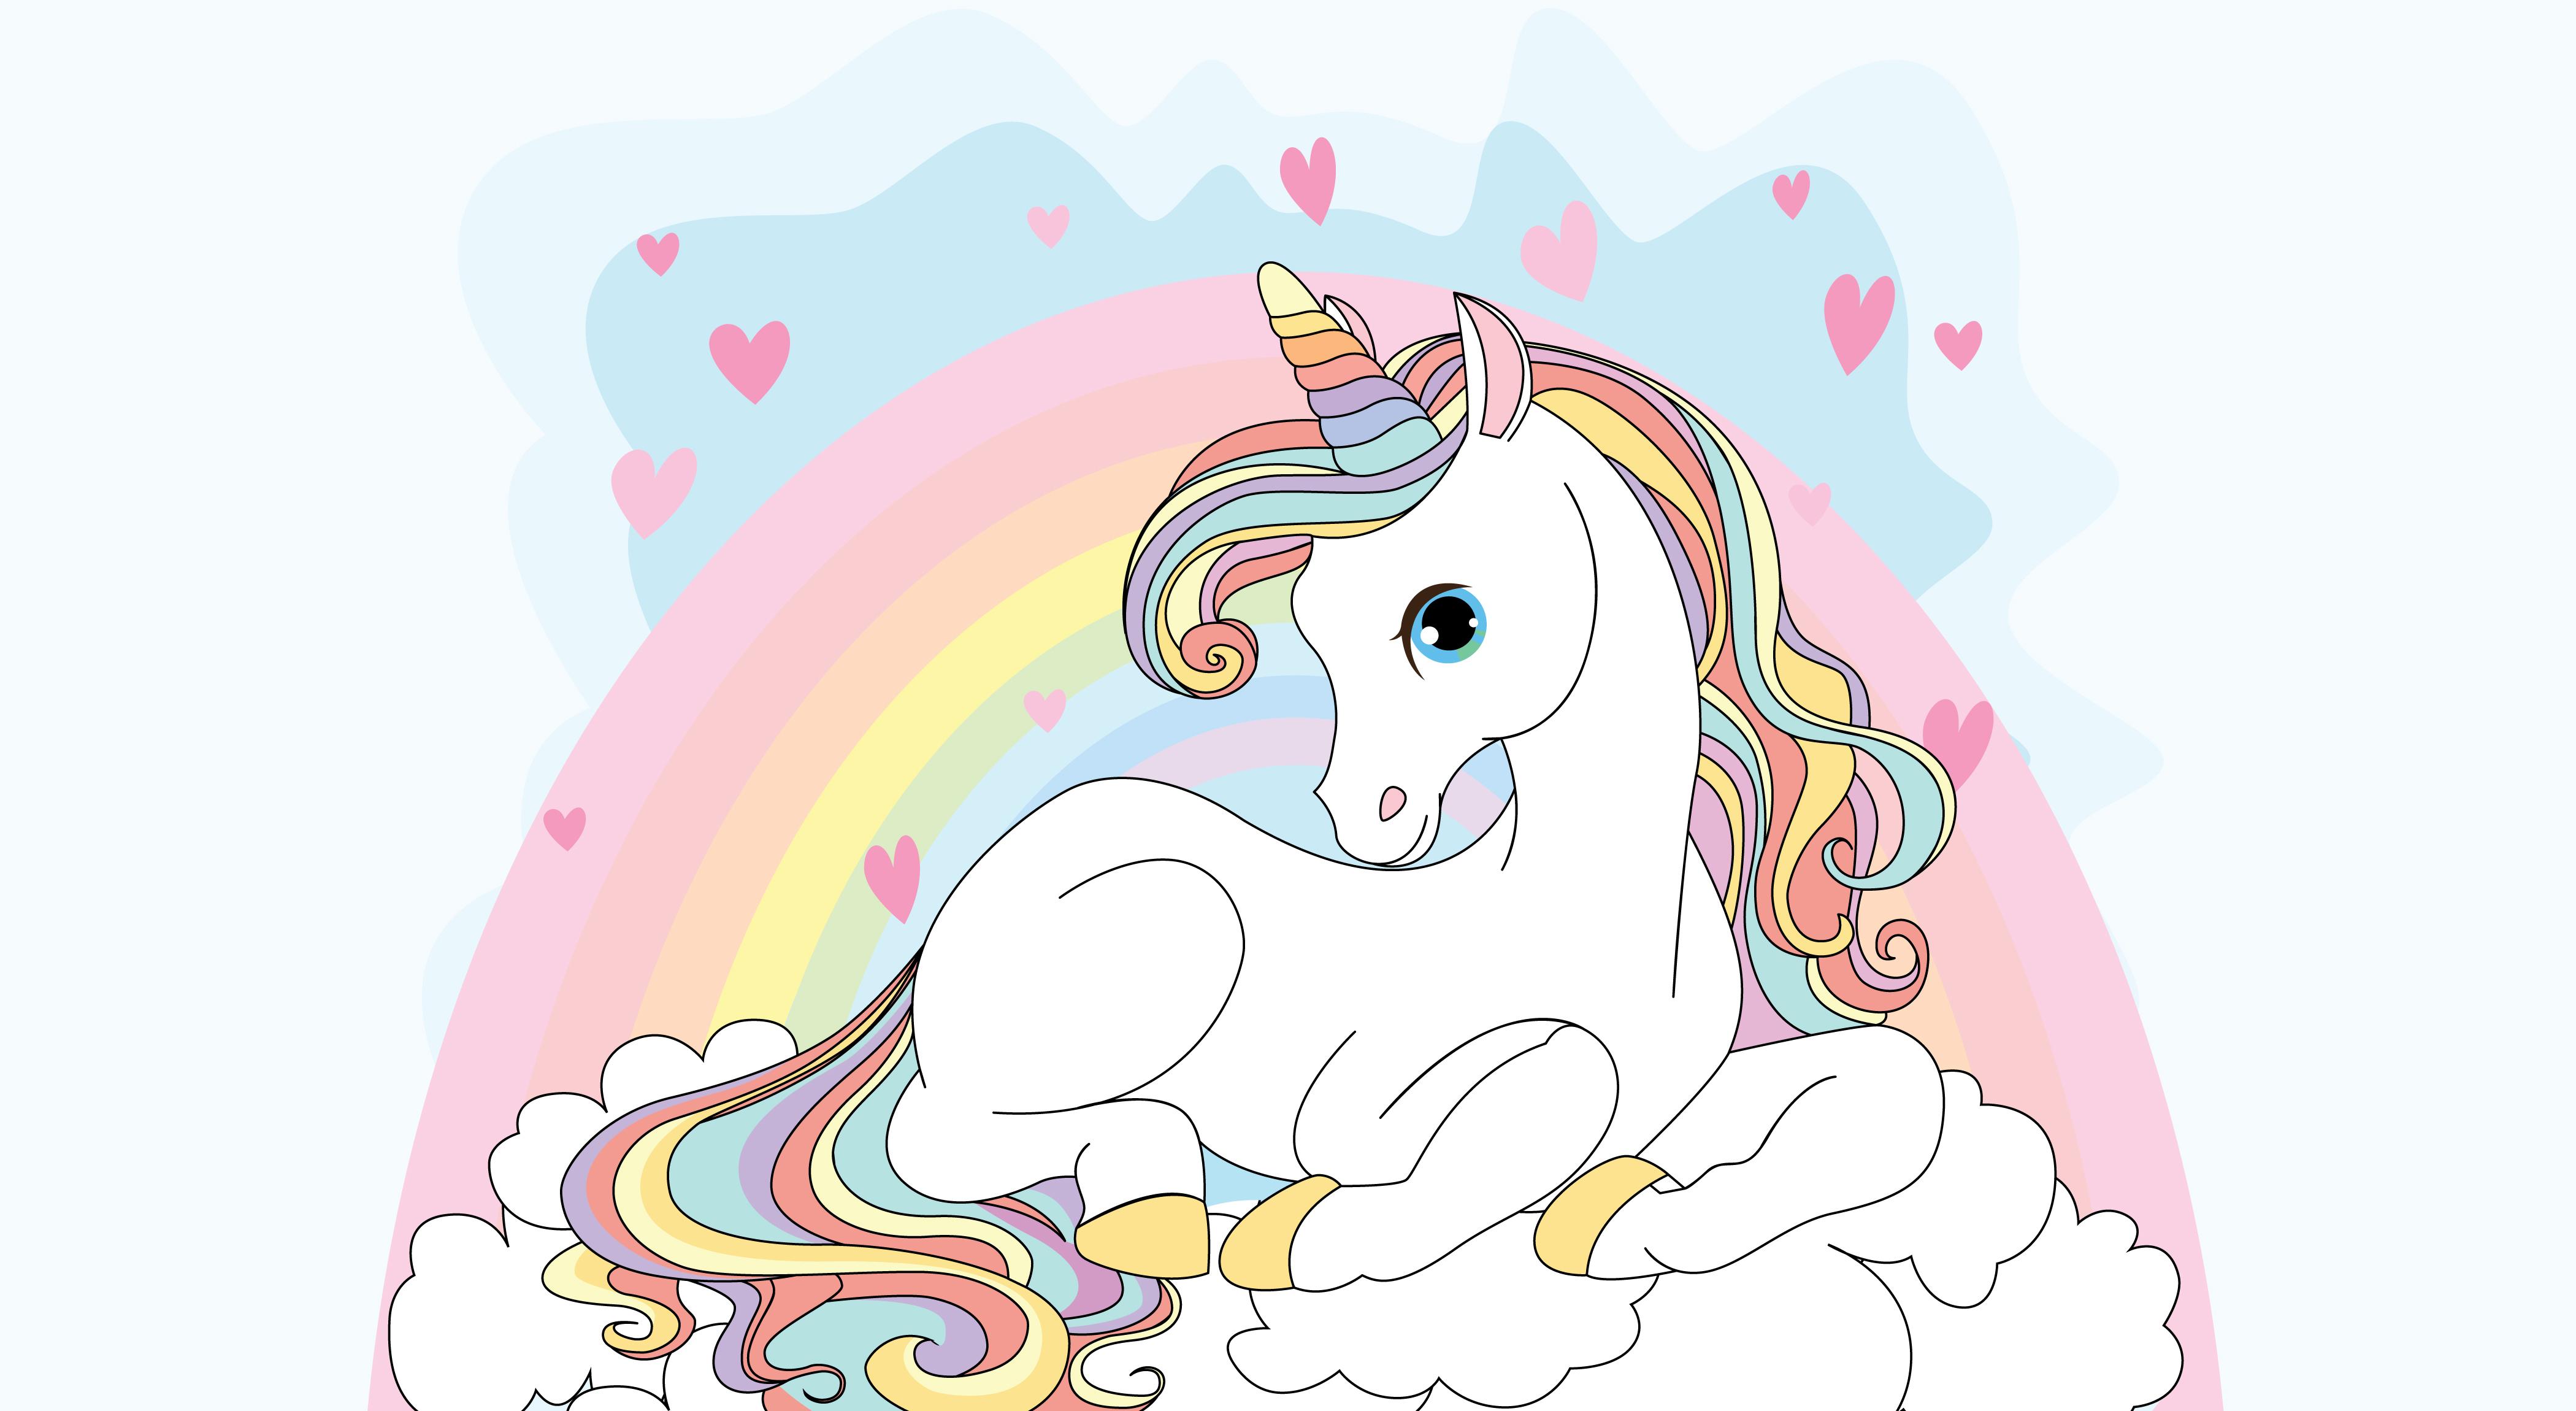 Top Five Gambar Unicorn Kartun Hd